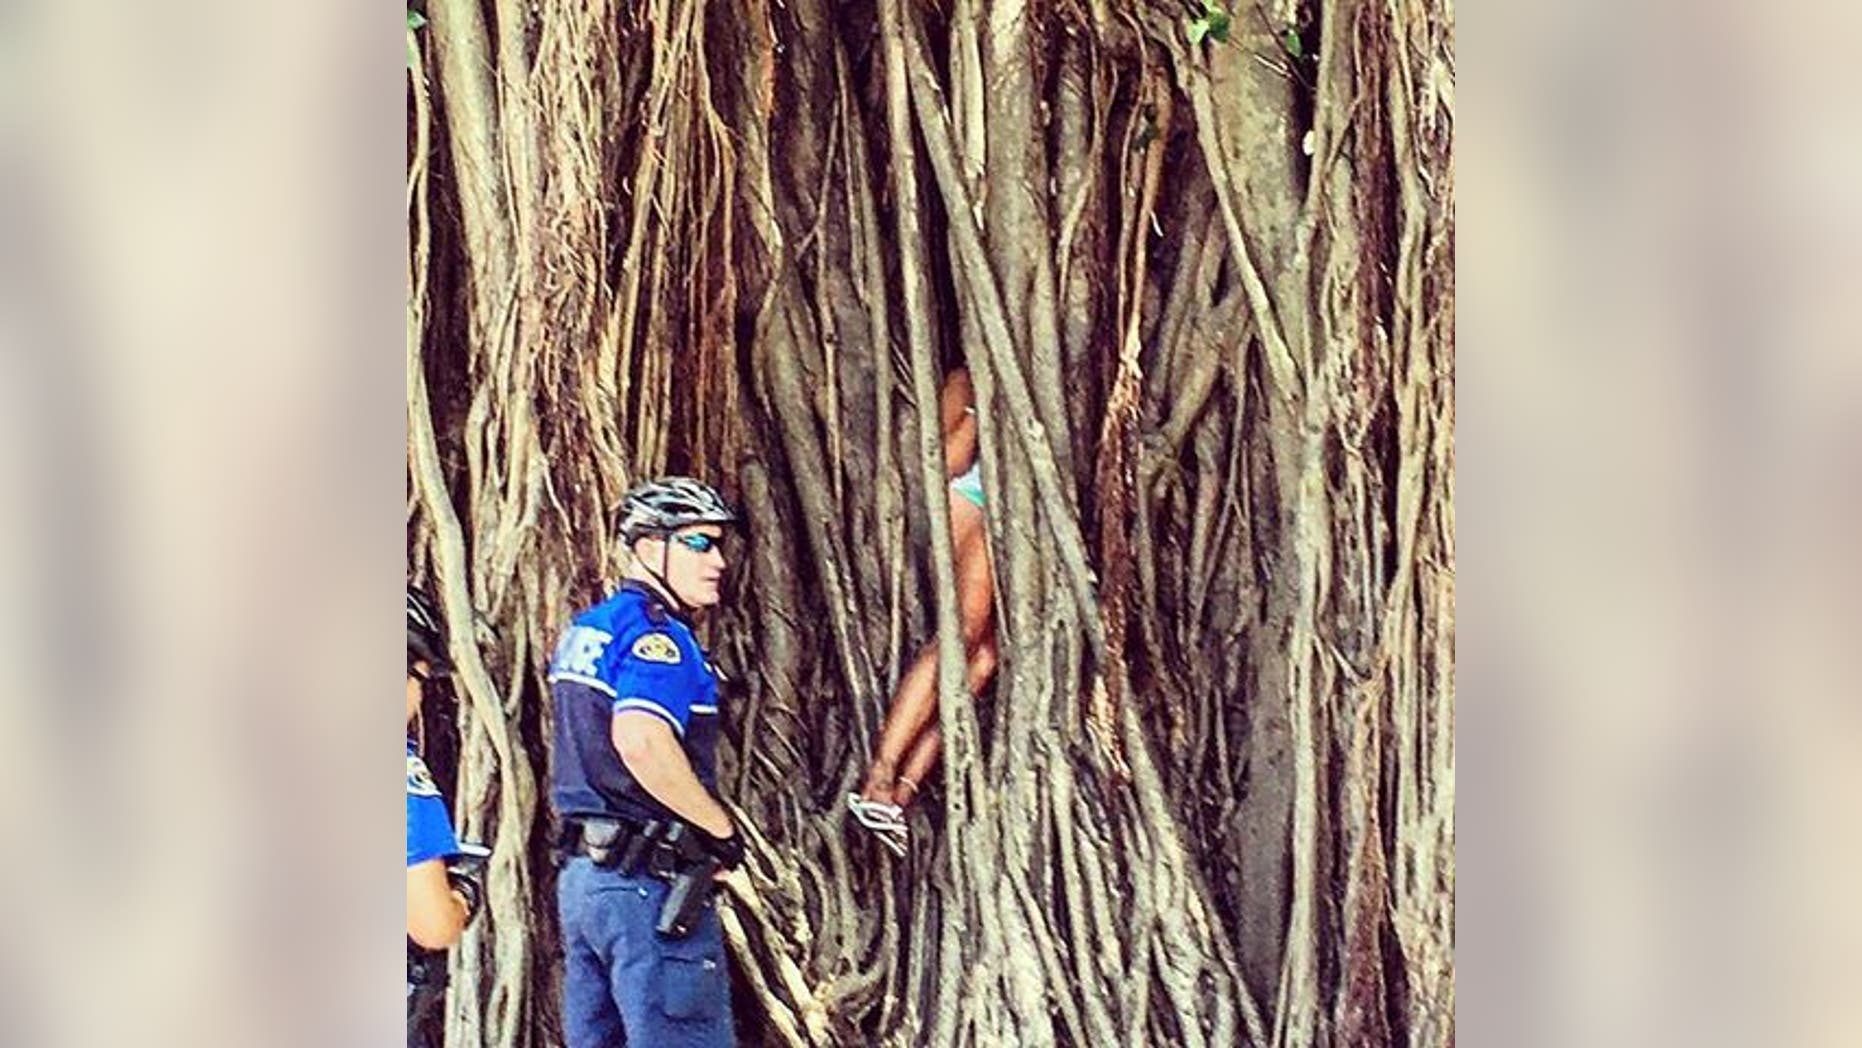 A woman became stuck inside a banyan tree.